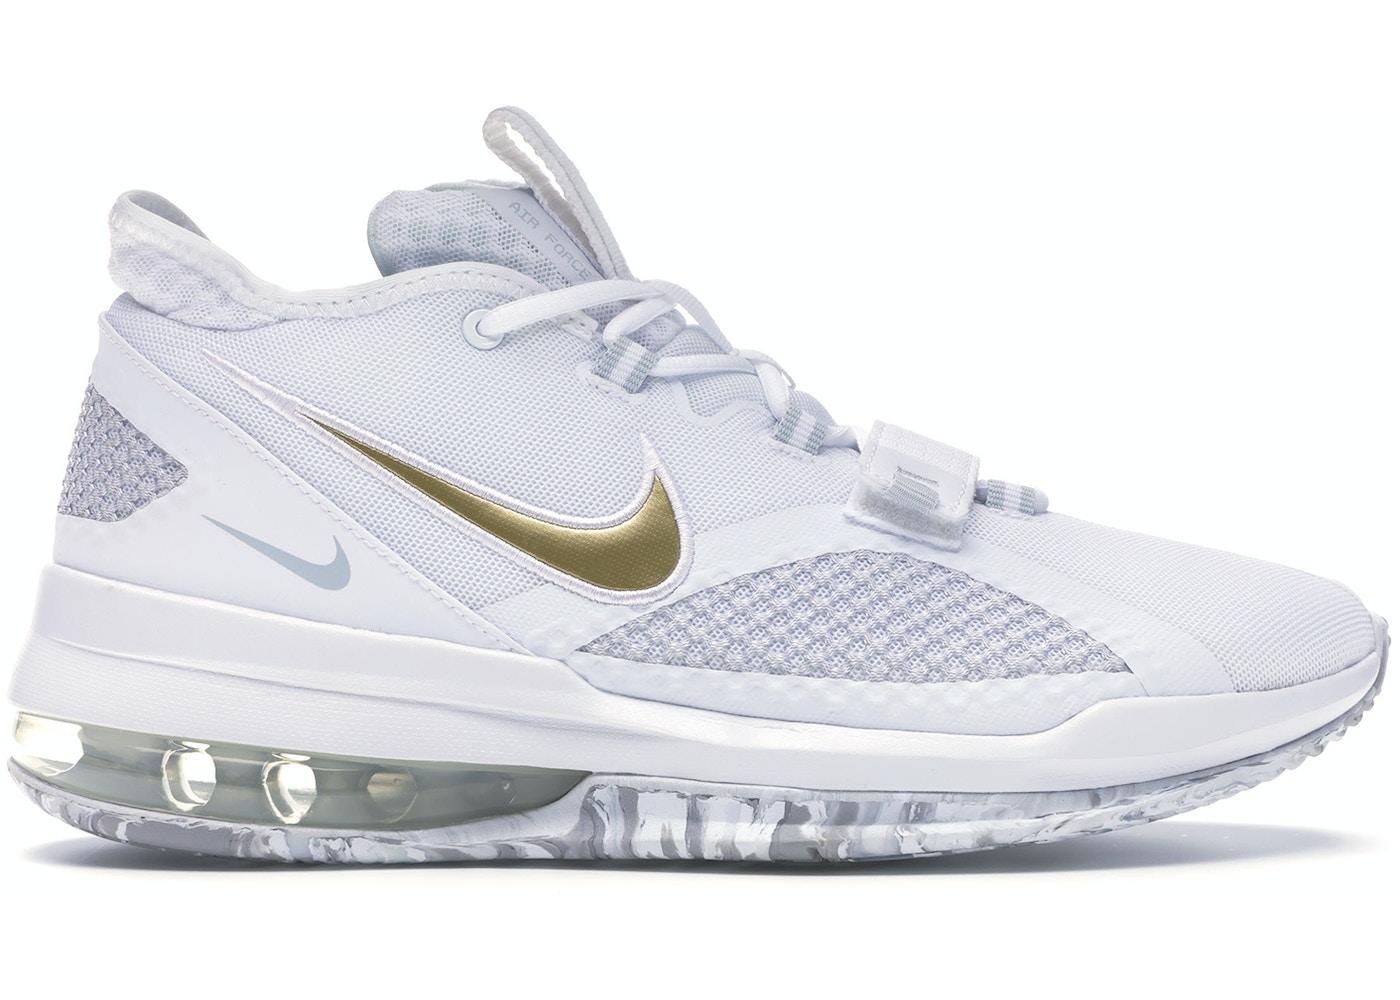 sí mismo difícil de complacer papelería  Nike Air Force Max Low White Gold - BV0651-100